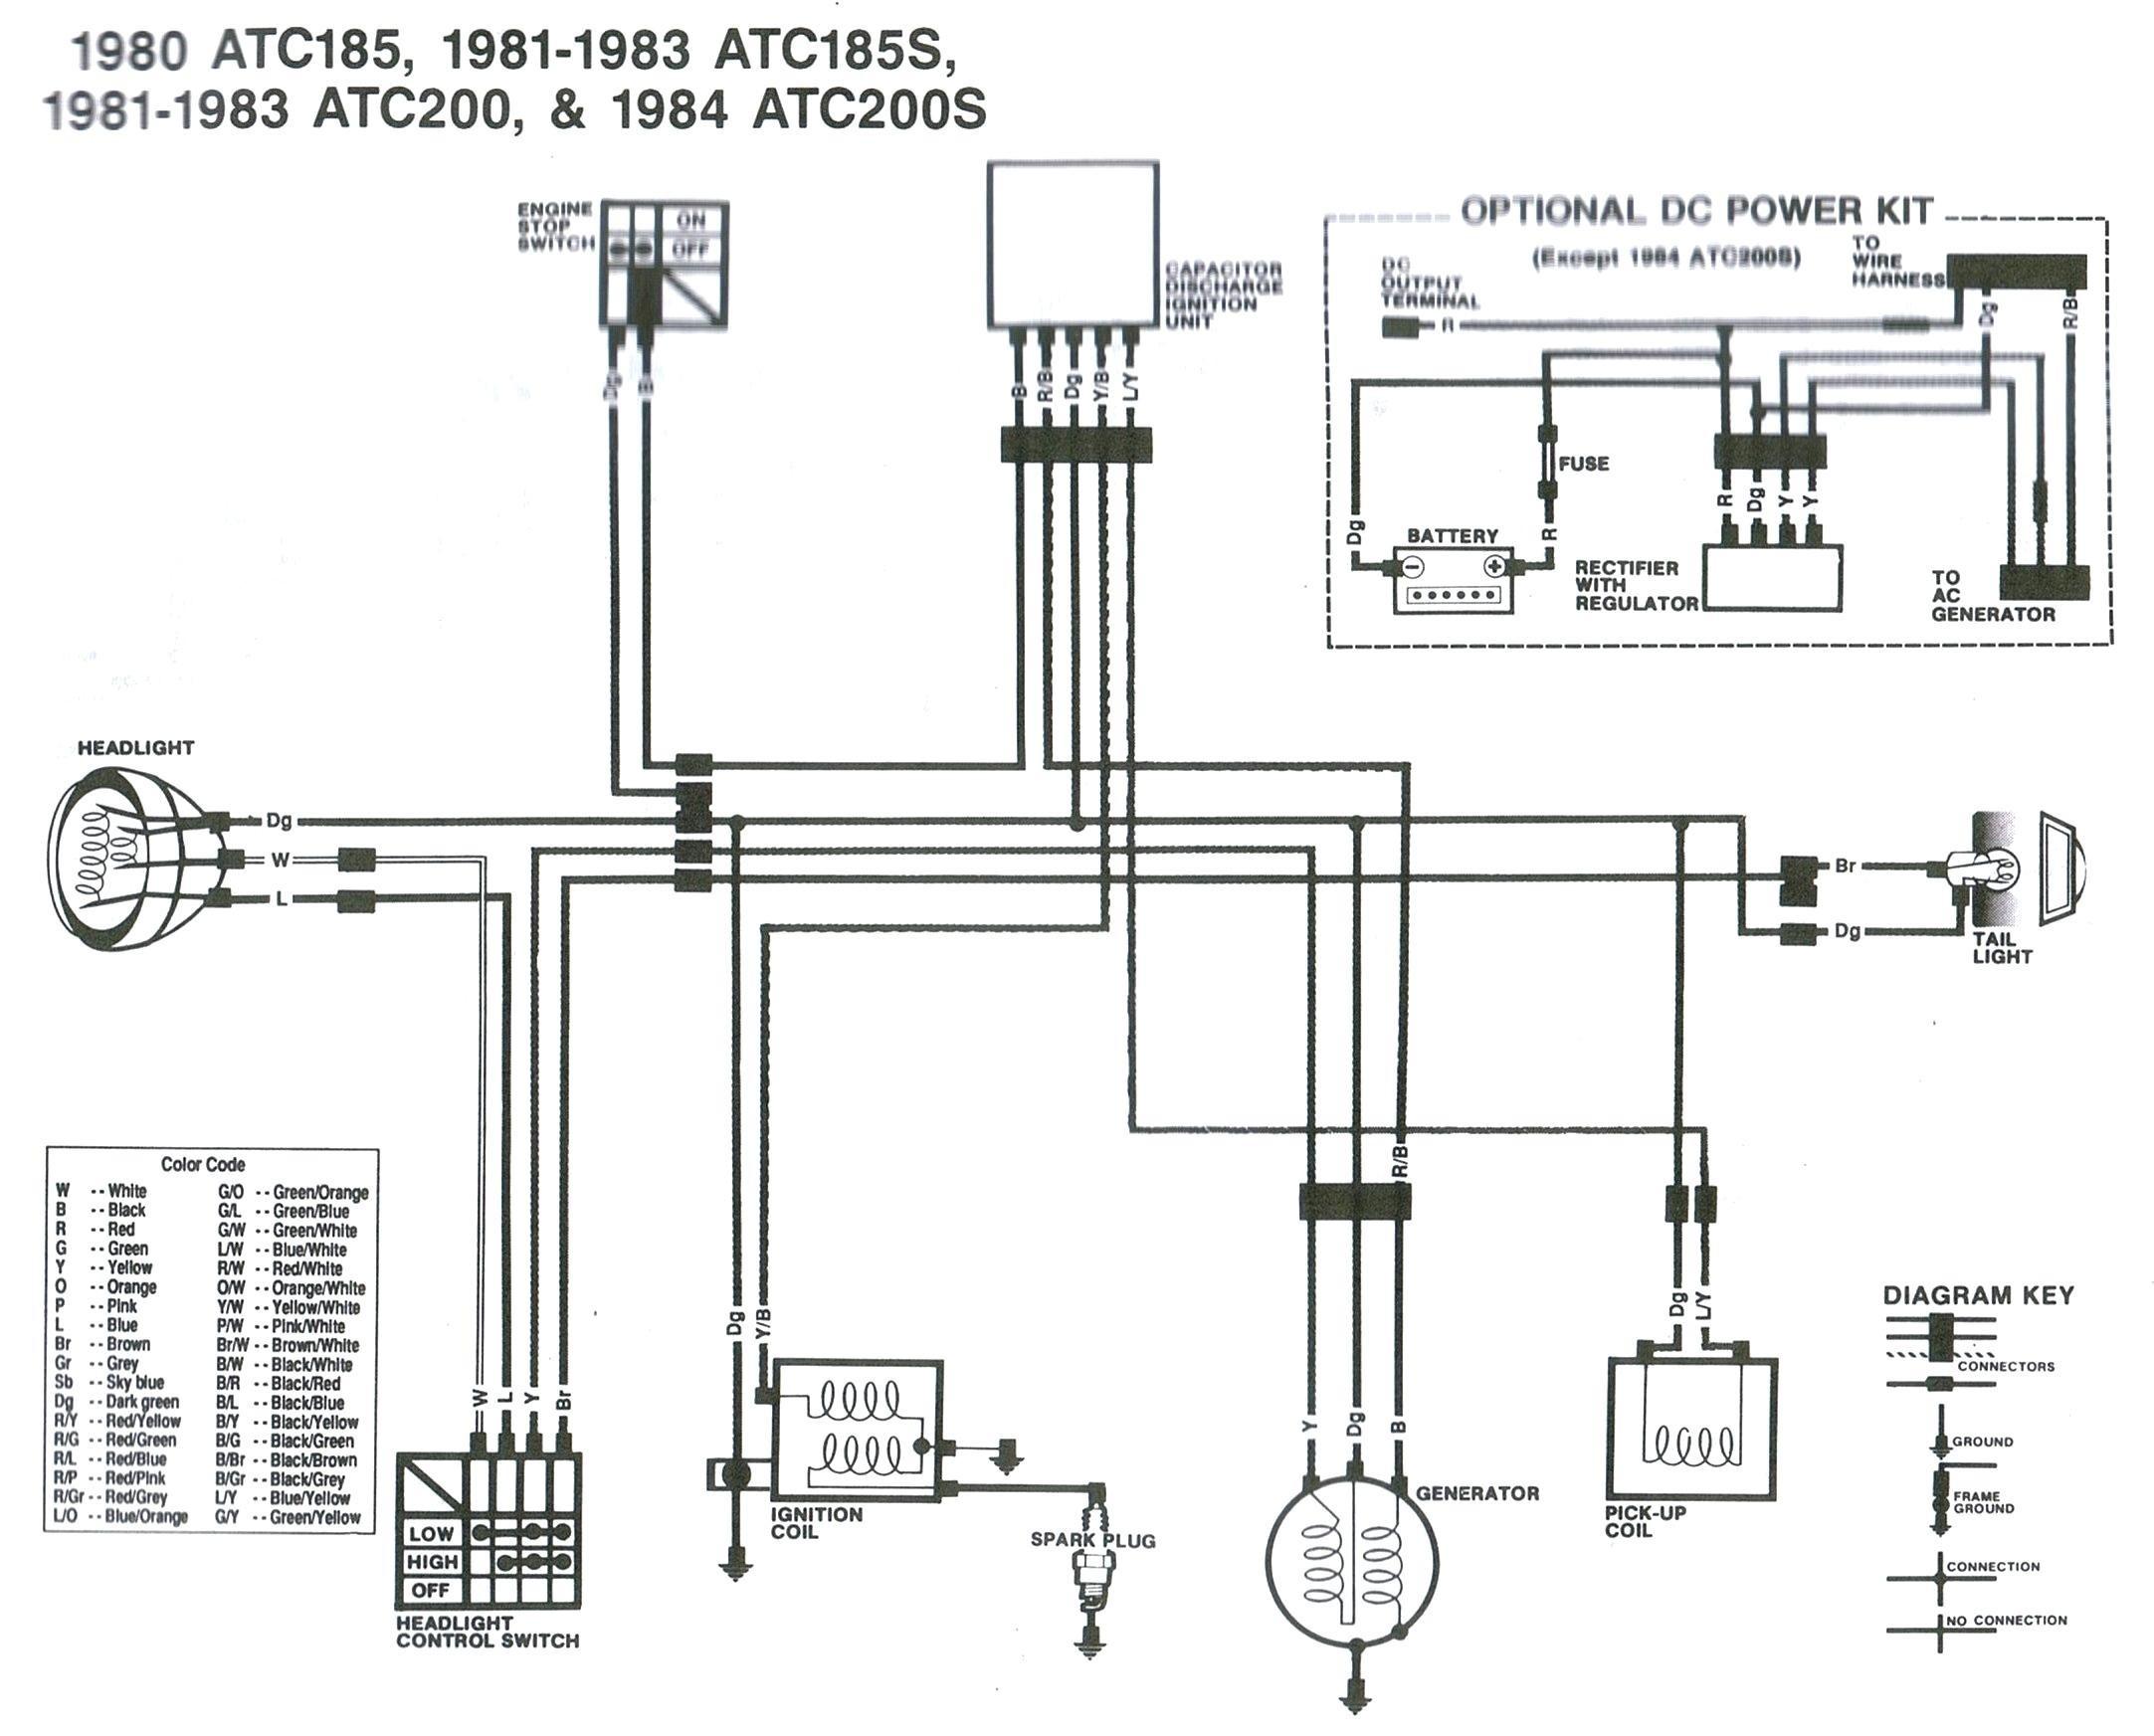 Diagram Database - Just The Best Diagram database Website | 1980 Toyota Truck Wiring Diagram |  | tom.waltz.diagramza.hosteria87.it